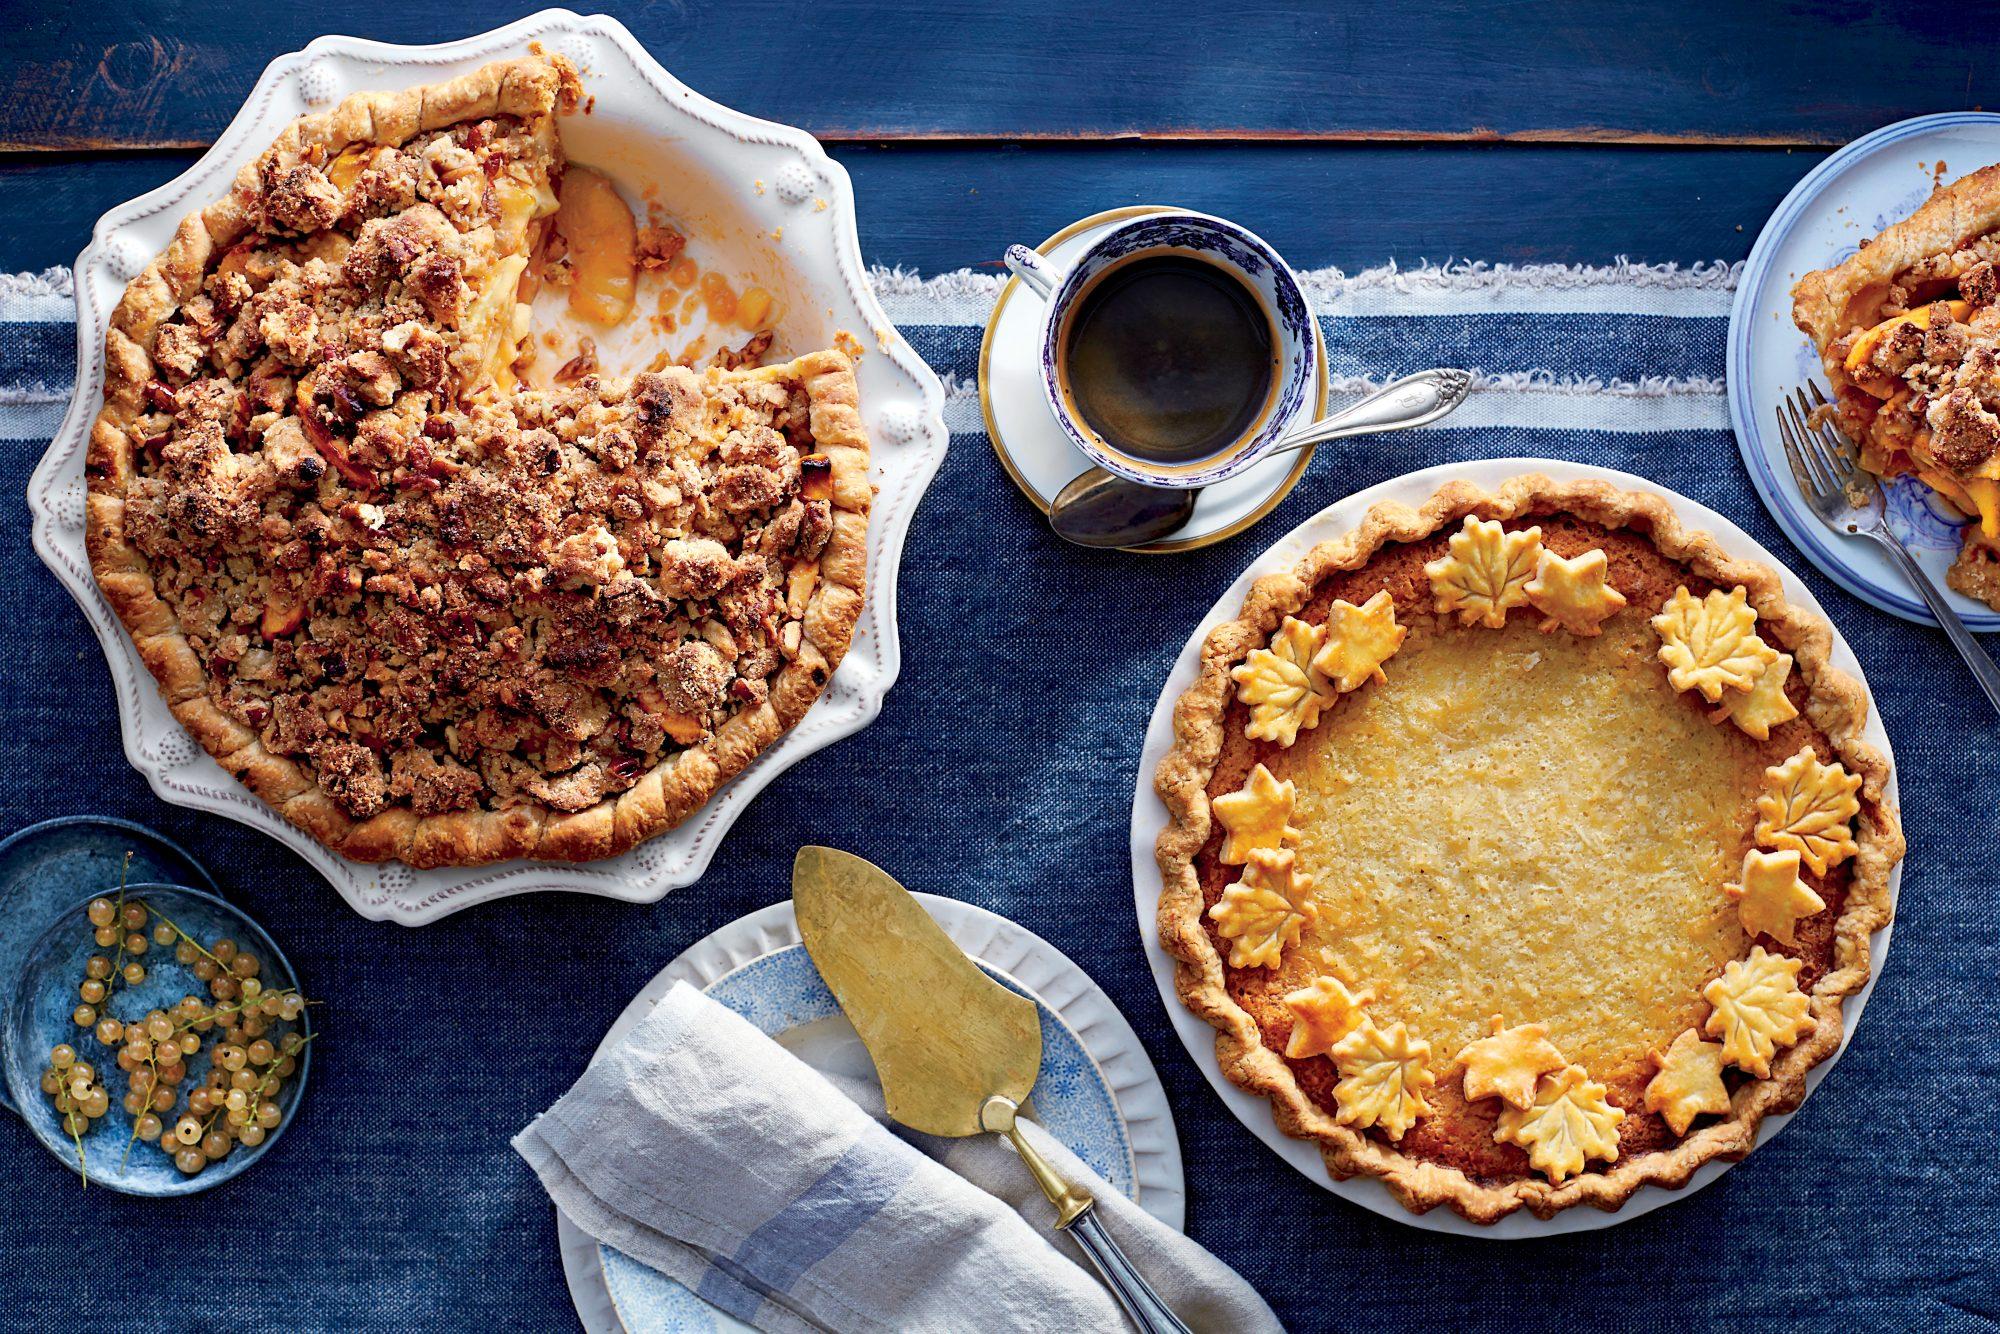 Ambrosia Pudding Pie